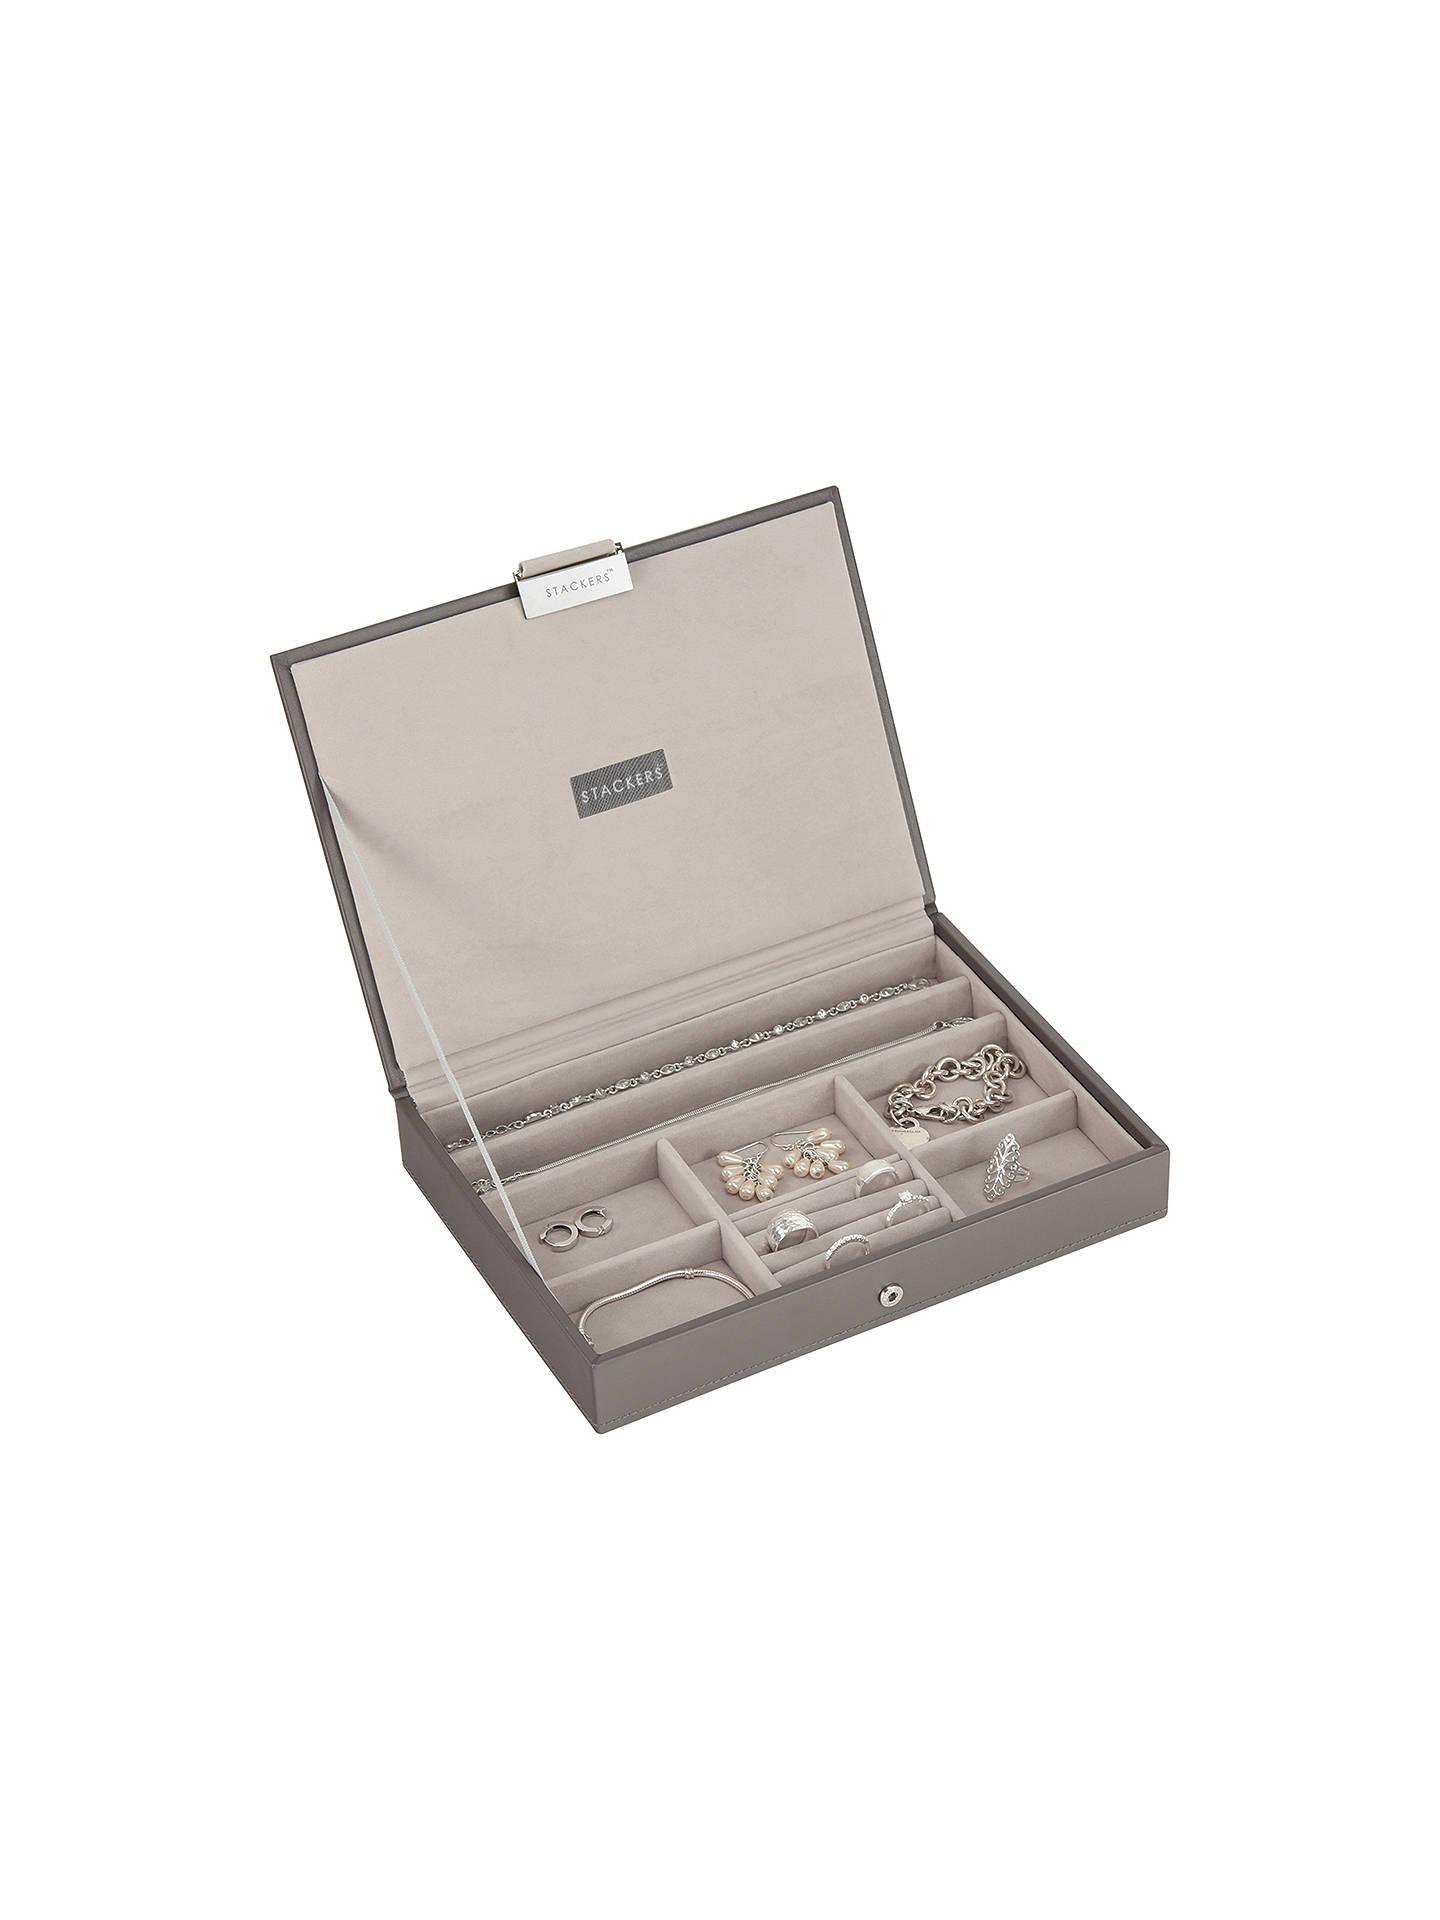 f967f3b44 ... Buy Stackers Jewellery Box Lid, Mink Online at johnlewis.com ...